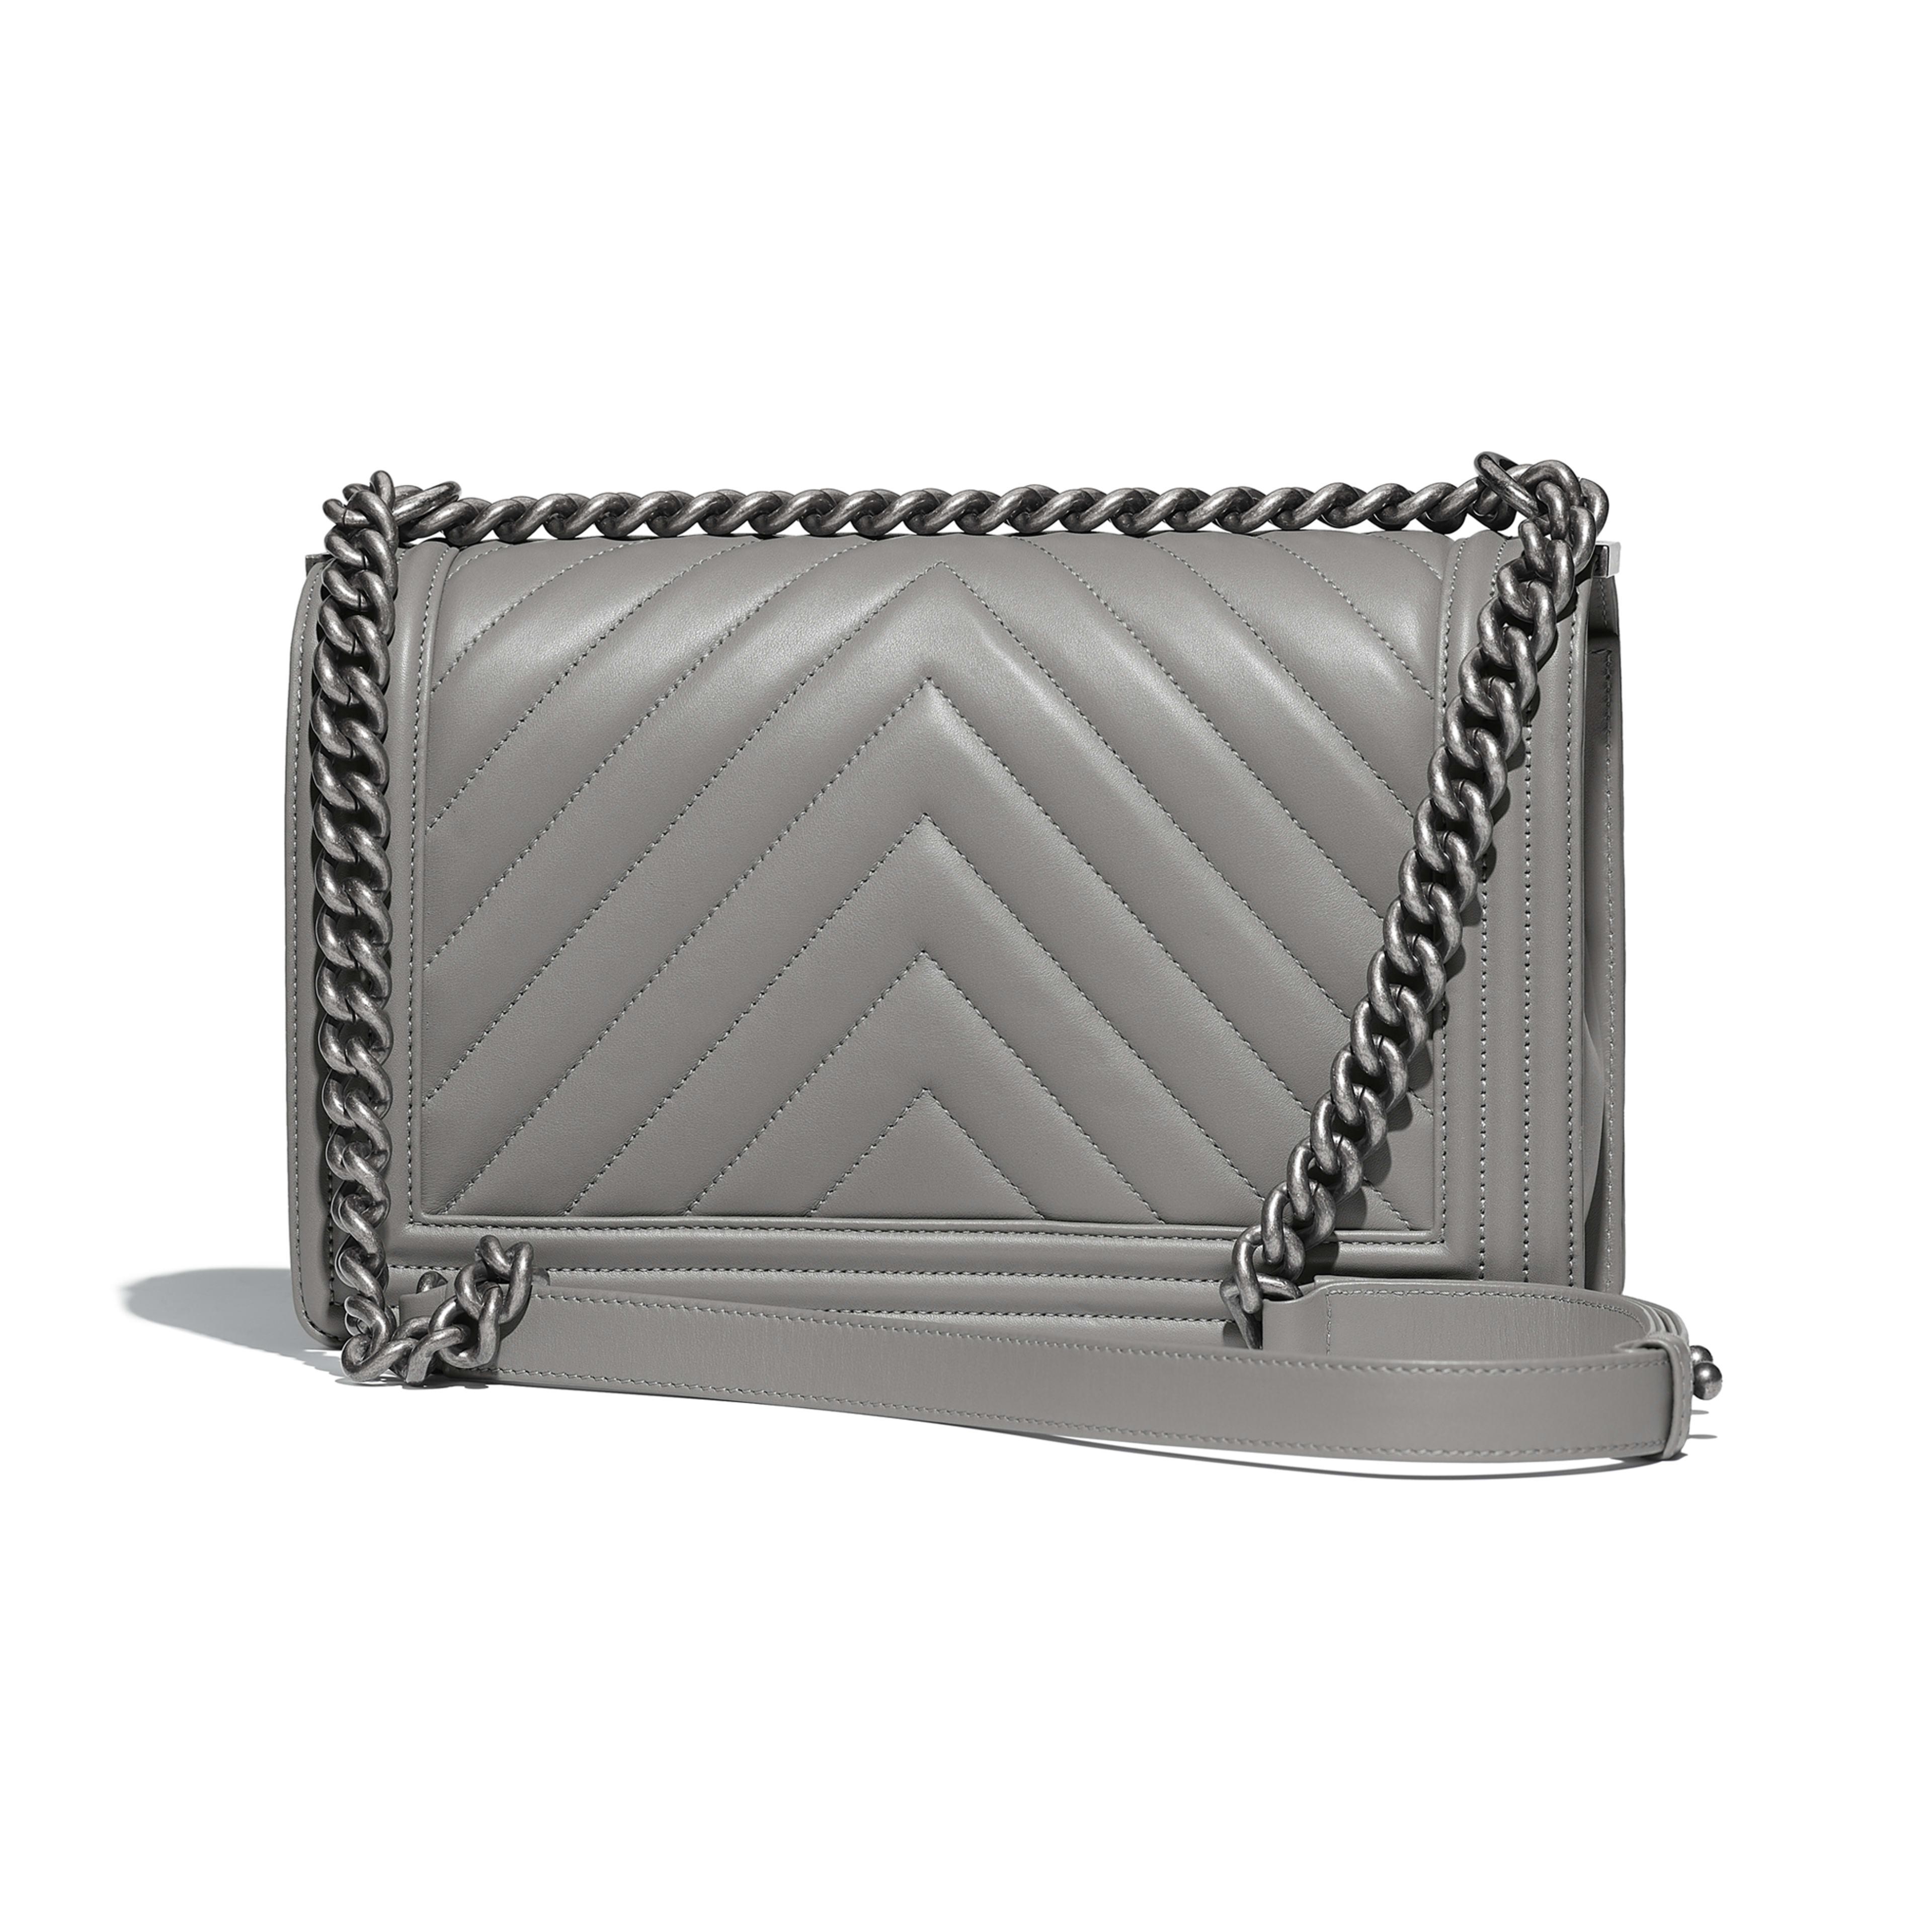 645b1f4a5cc9c Calfskin RutheniumFinish Metal Gray Large BOY CHANEL Handbag CHANEL